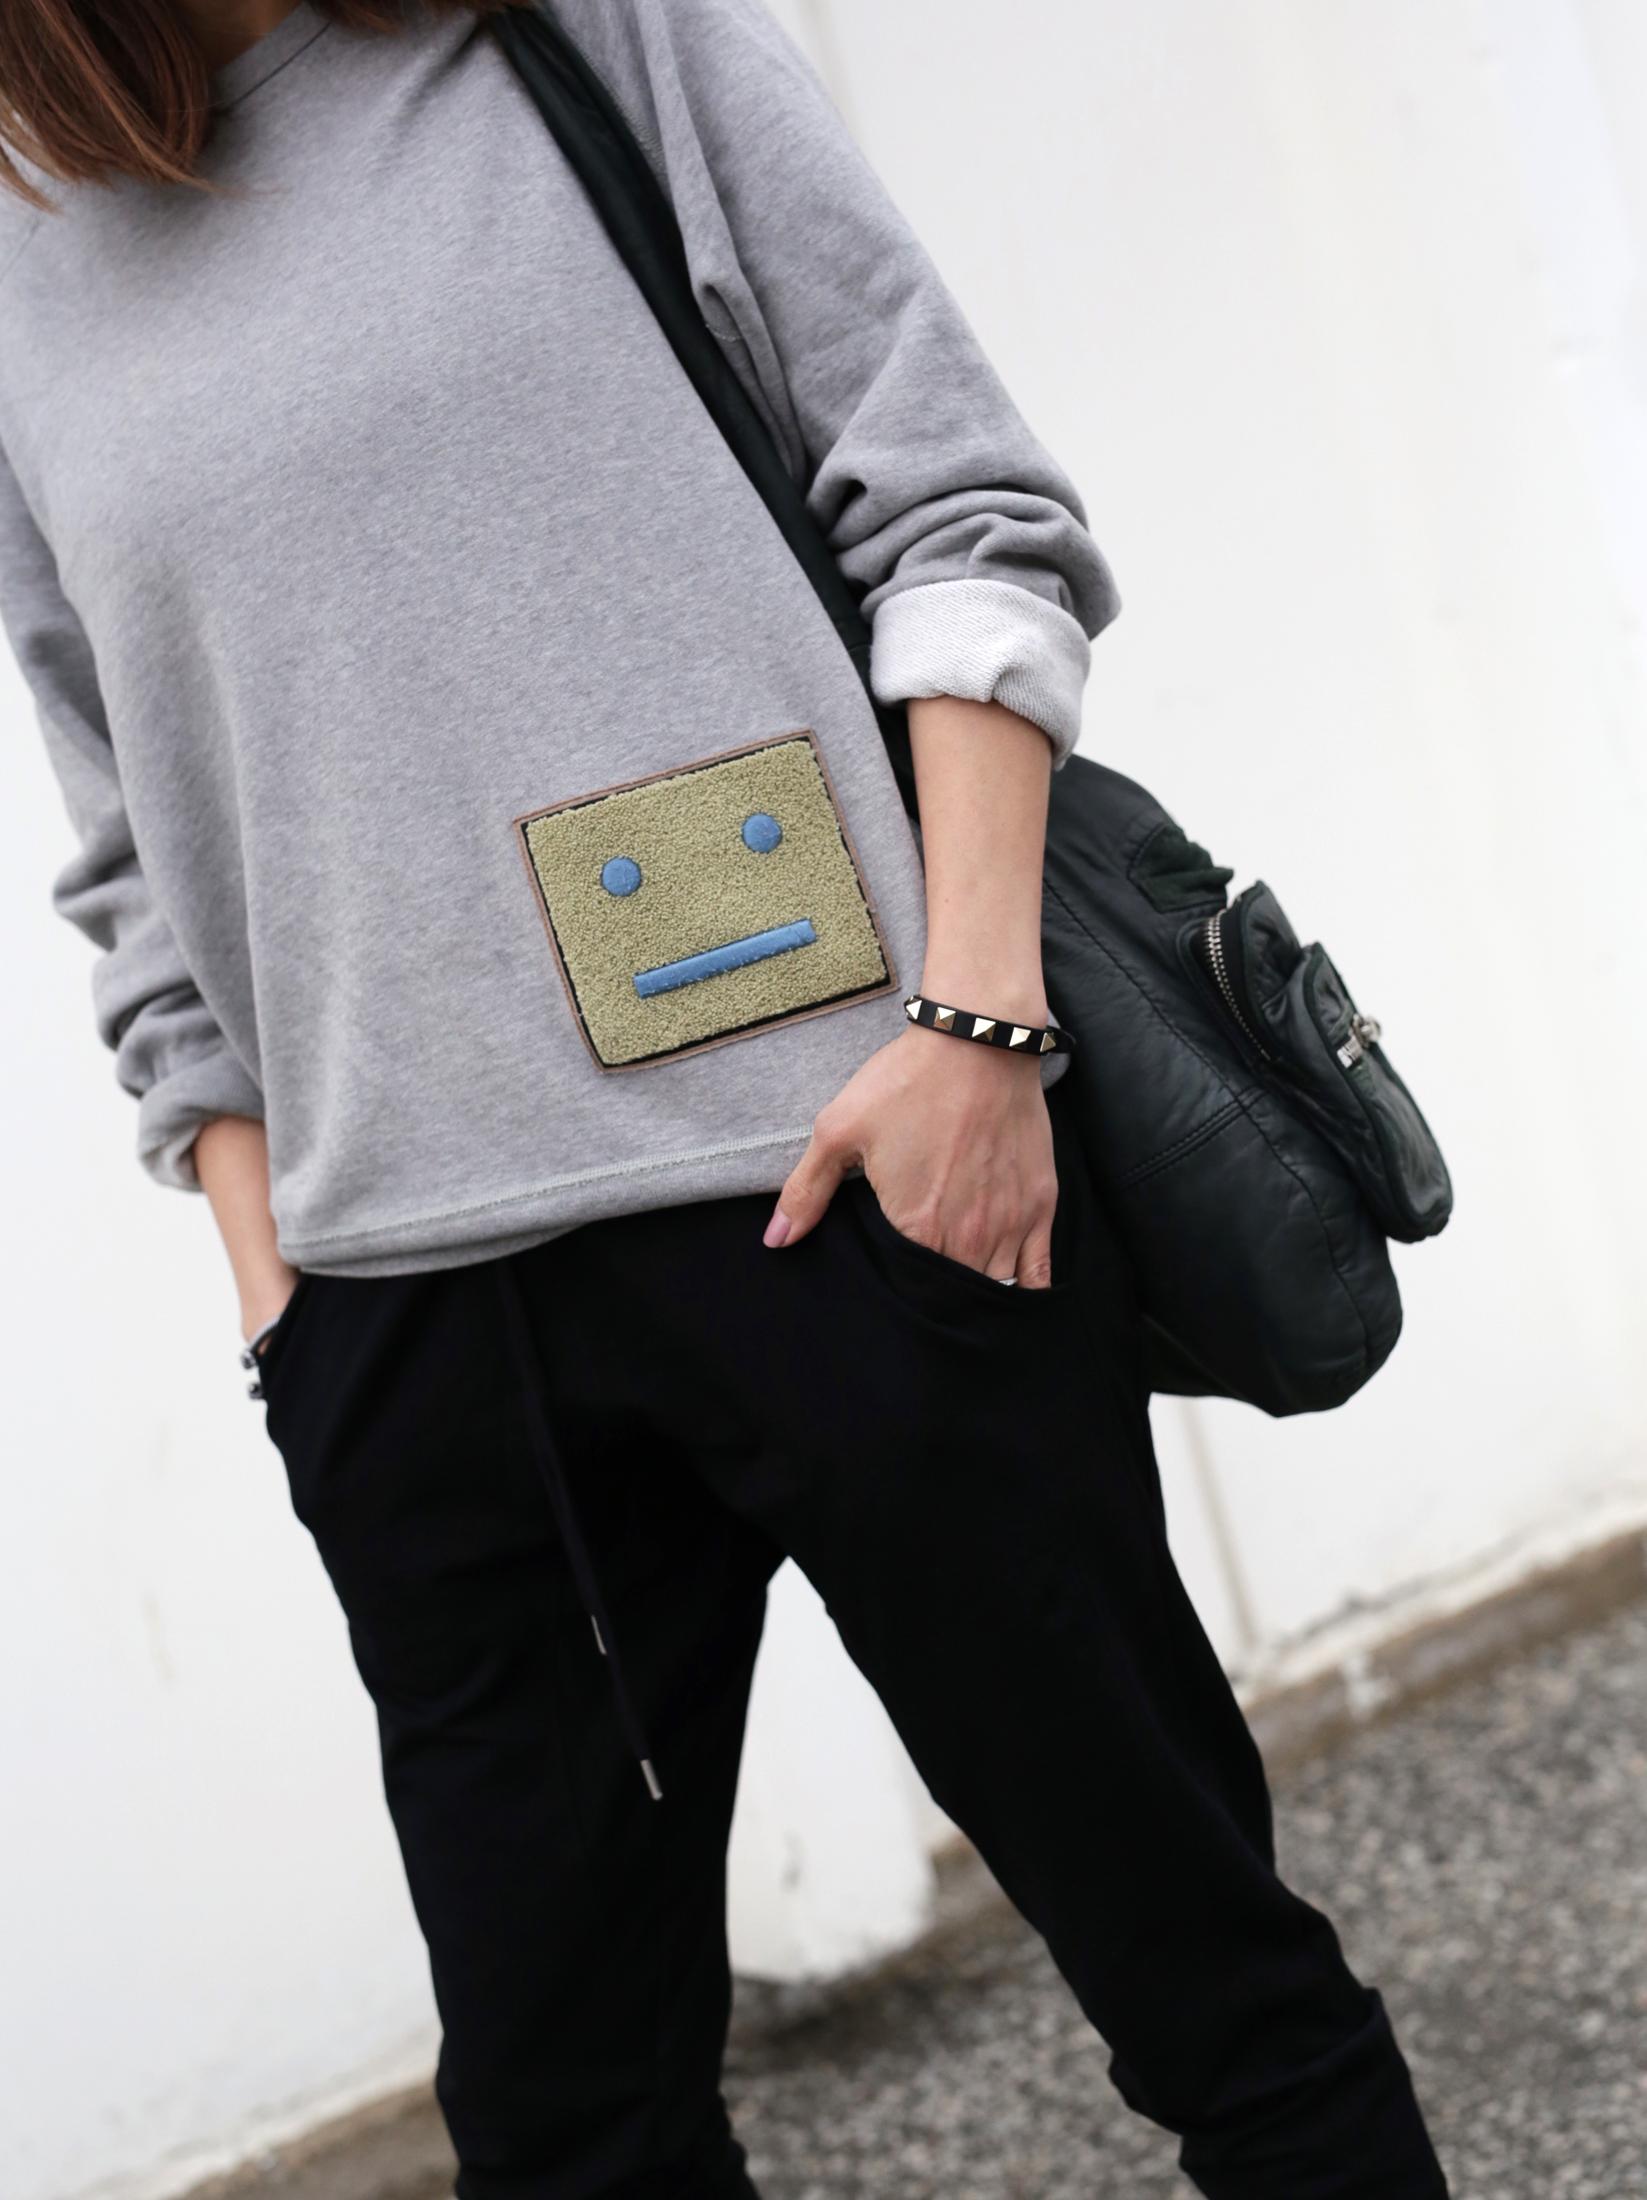 3 Ways To Rock Athleisure Wear - Leather Jacket, Acne Sweater, Alexander Wang Donna bag, metallic Vans sneakers_7642.JPG